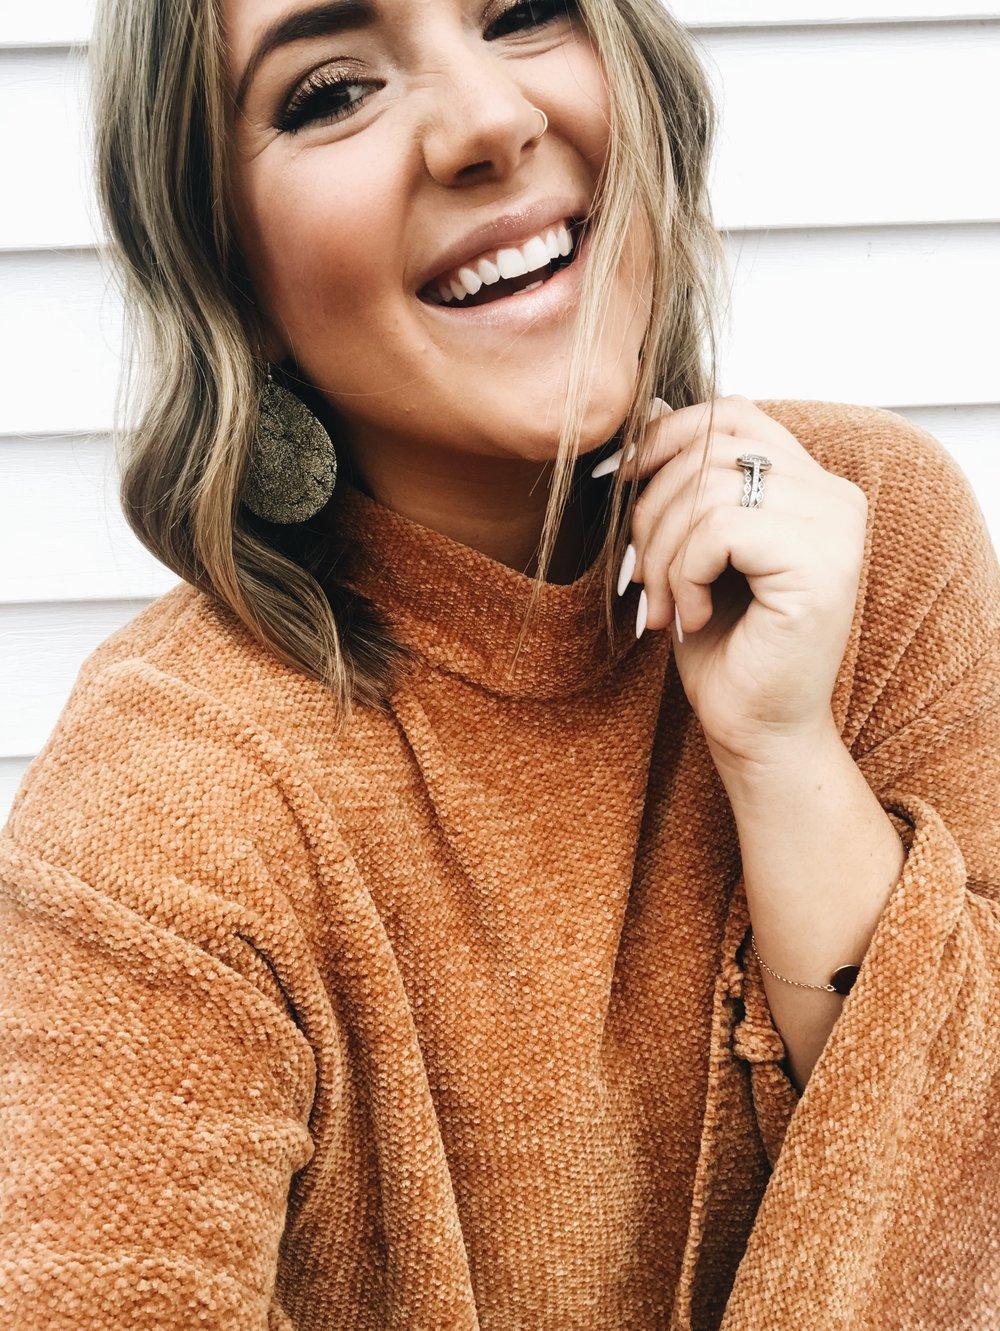 Emma Steadman SeneGence LipSense training and community